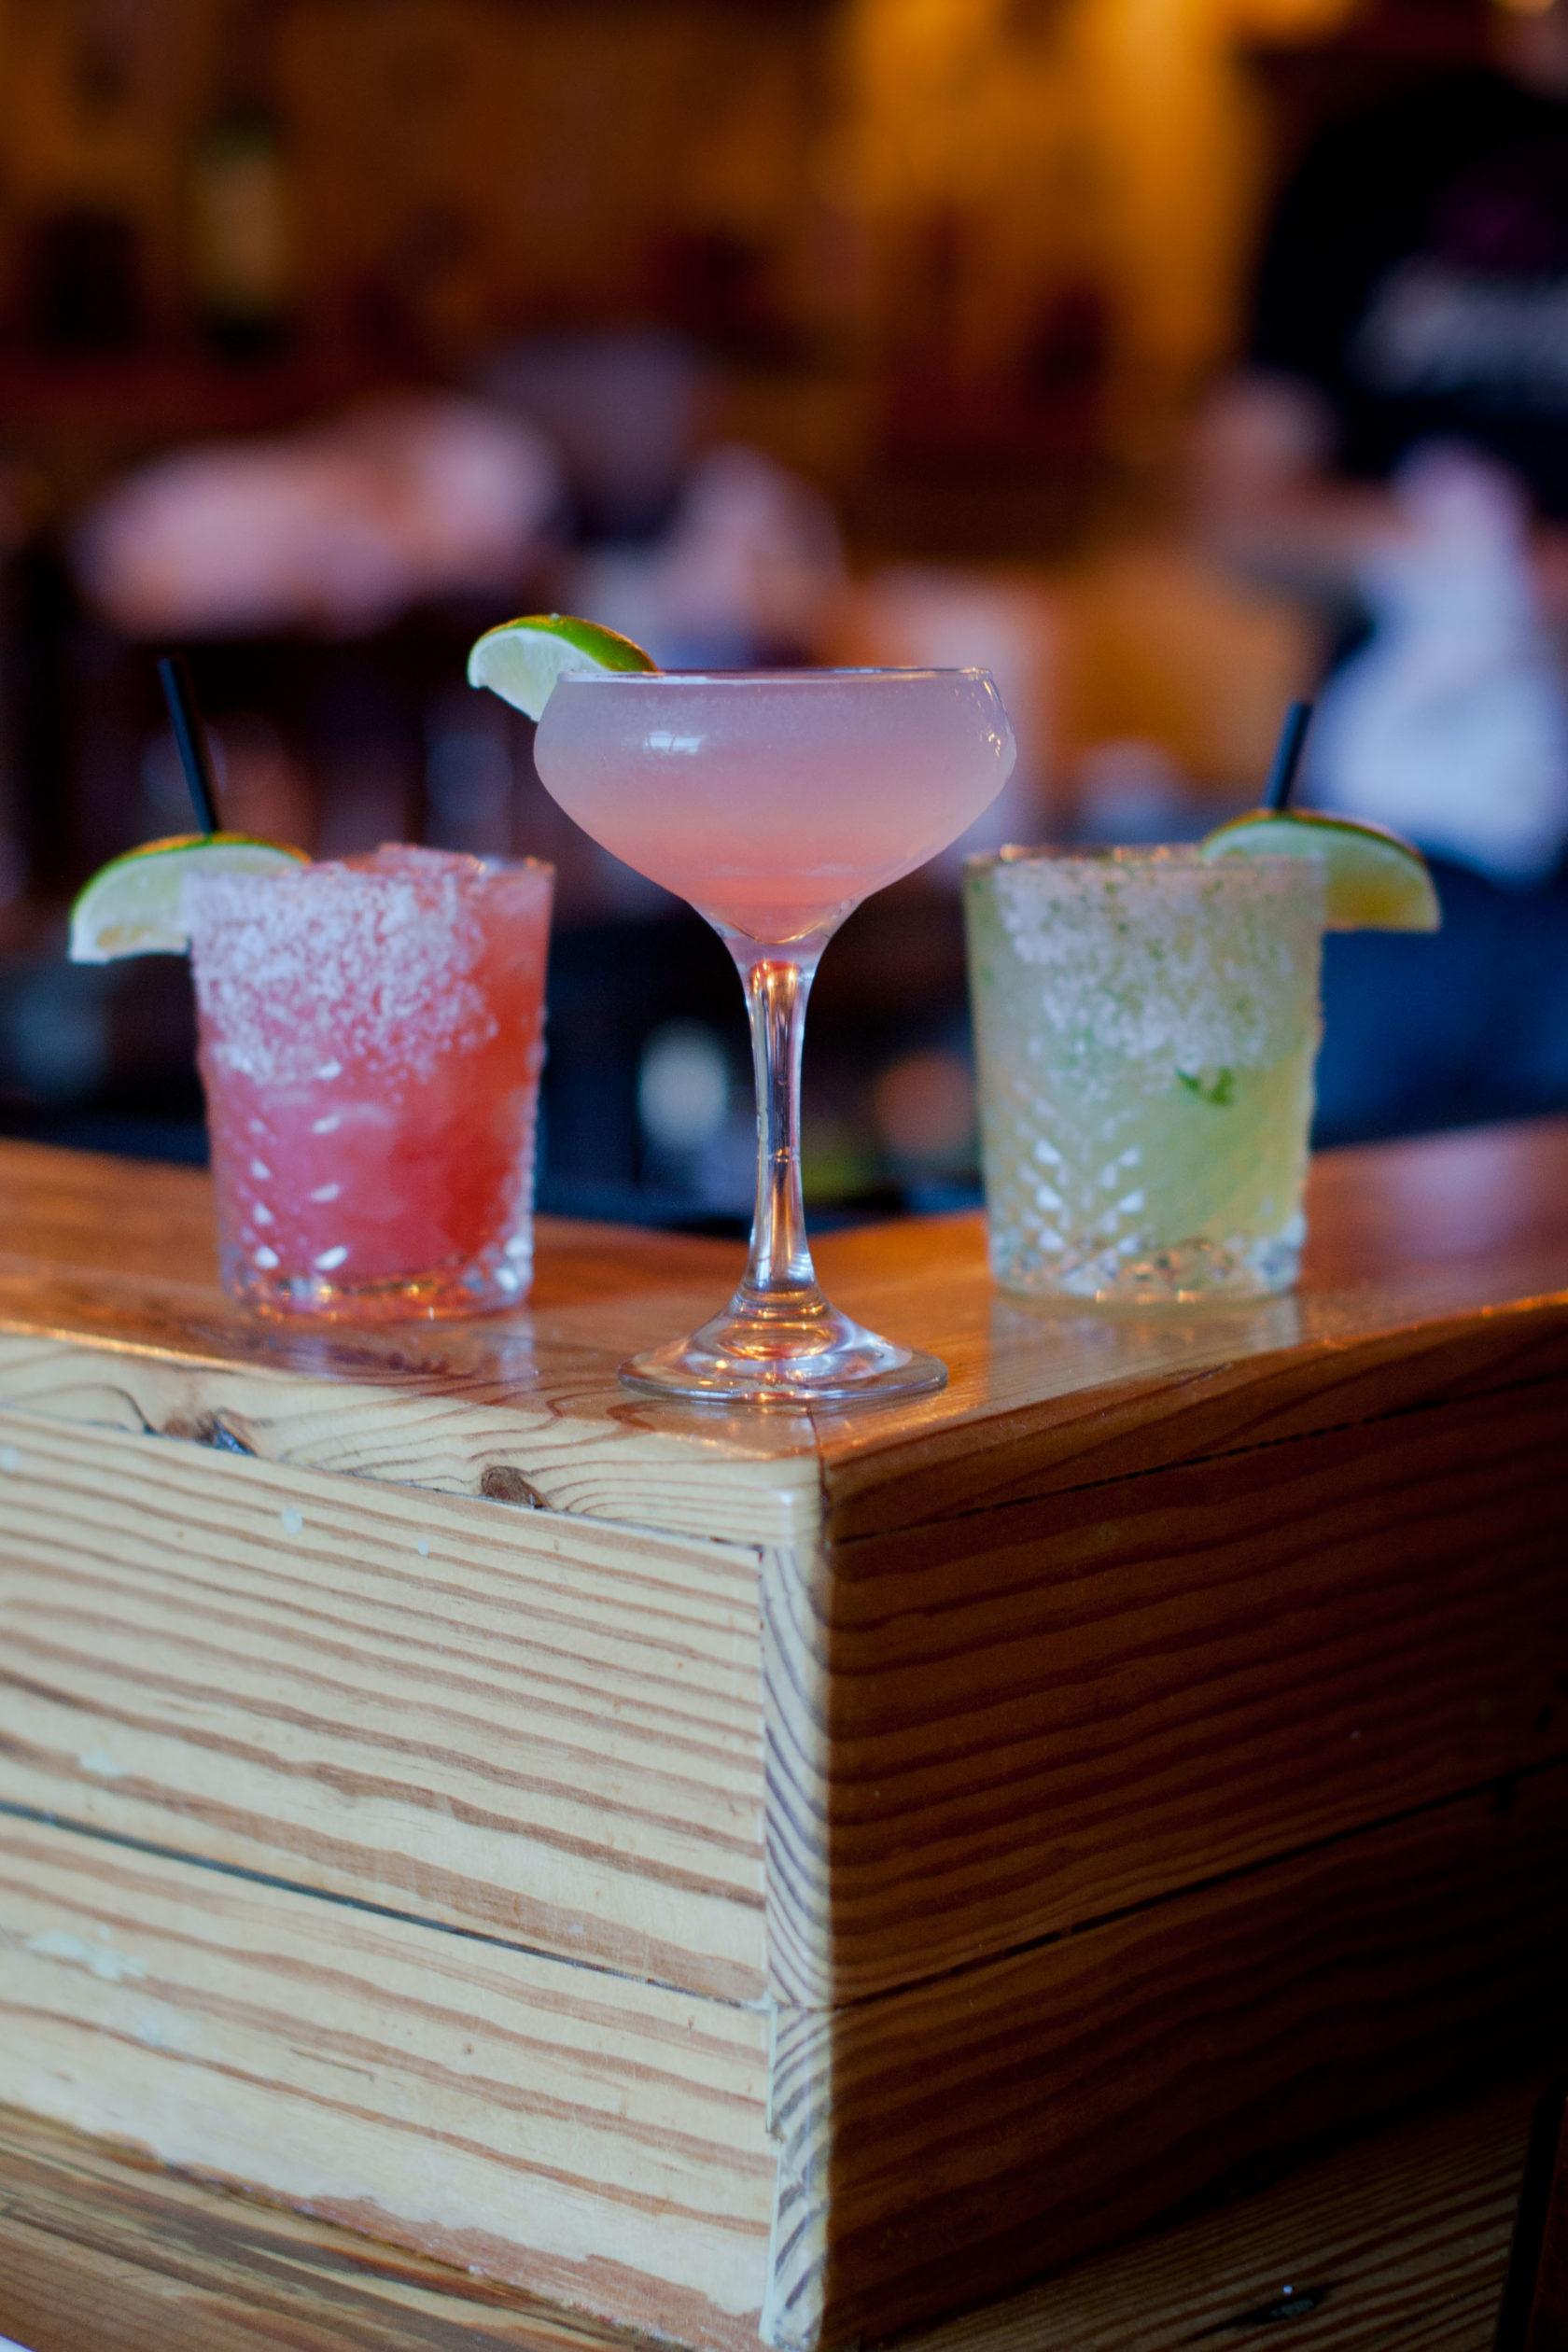 Jersey City Weekly Happy Hour Specials: 1/7/18 – 1/13/18